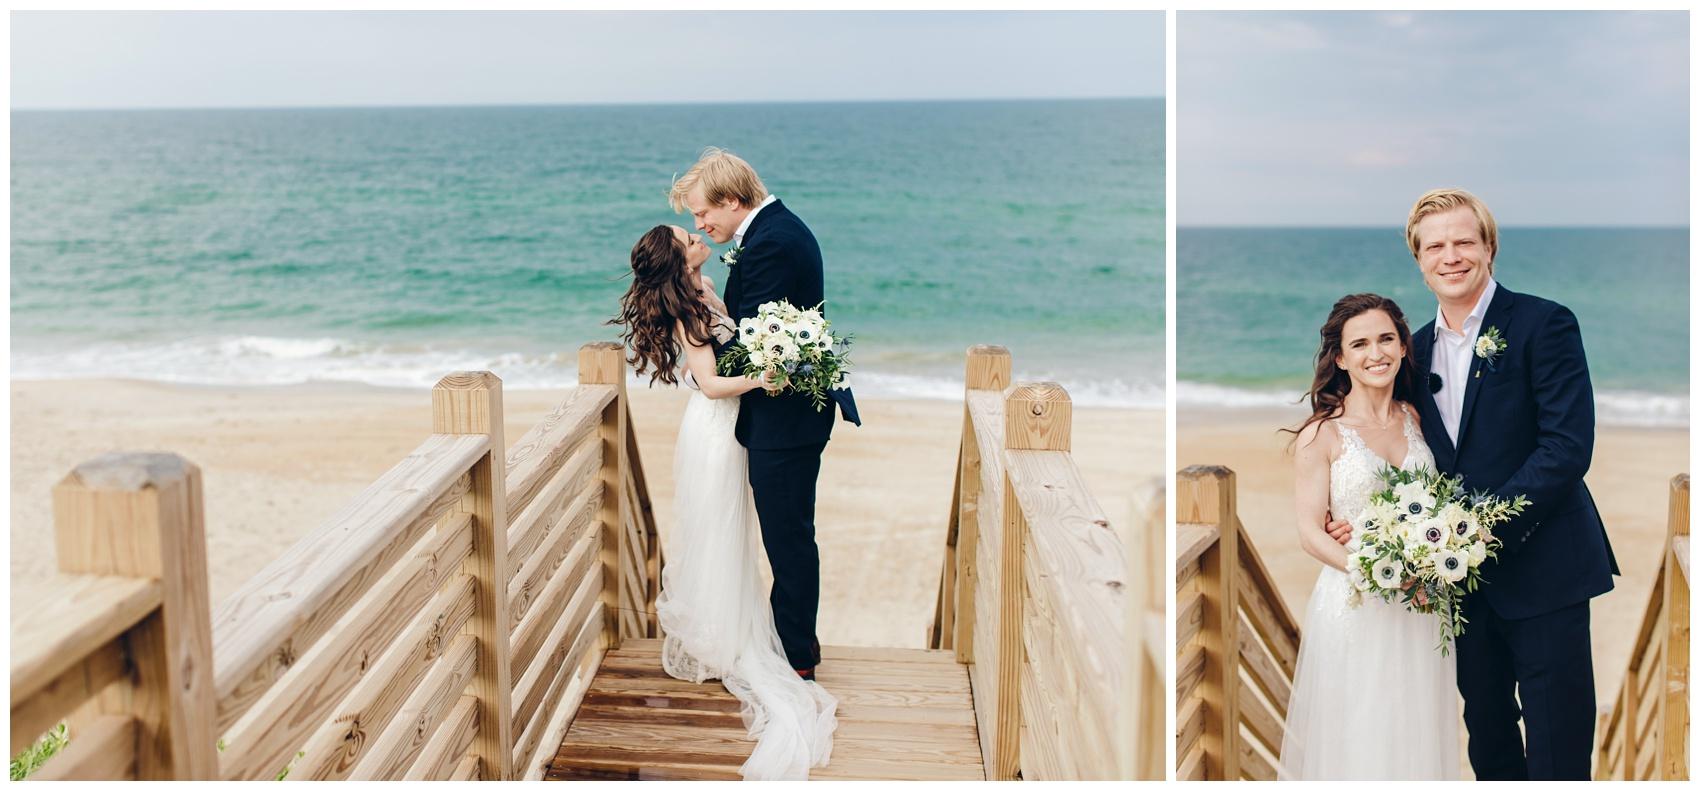 Outer-Banks-Corolla-Wedding_0075.jpg